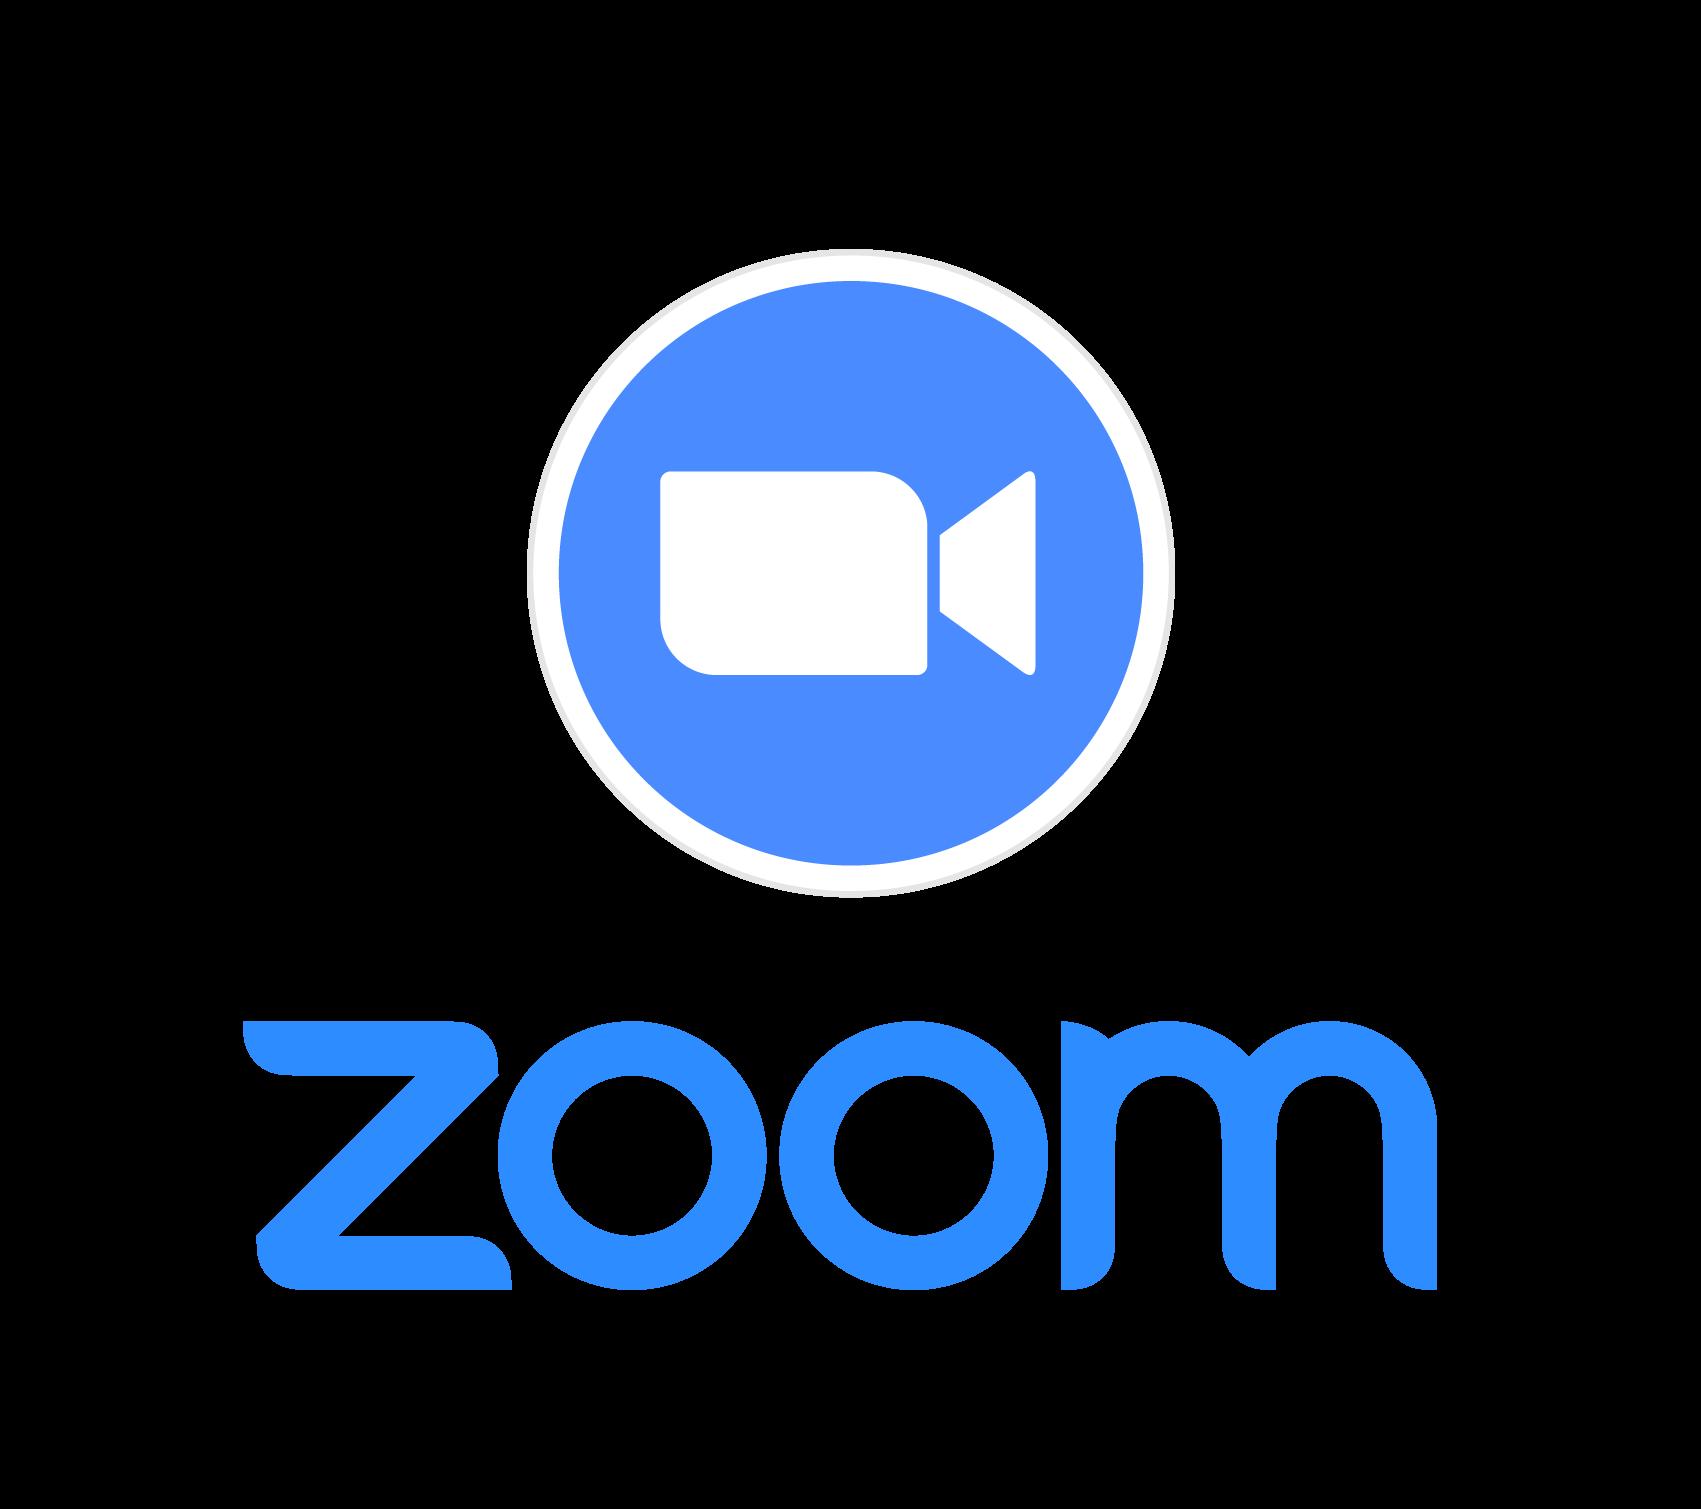 如何使用 Zoom 直播平台?